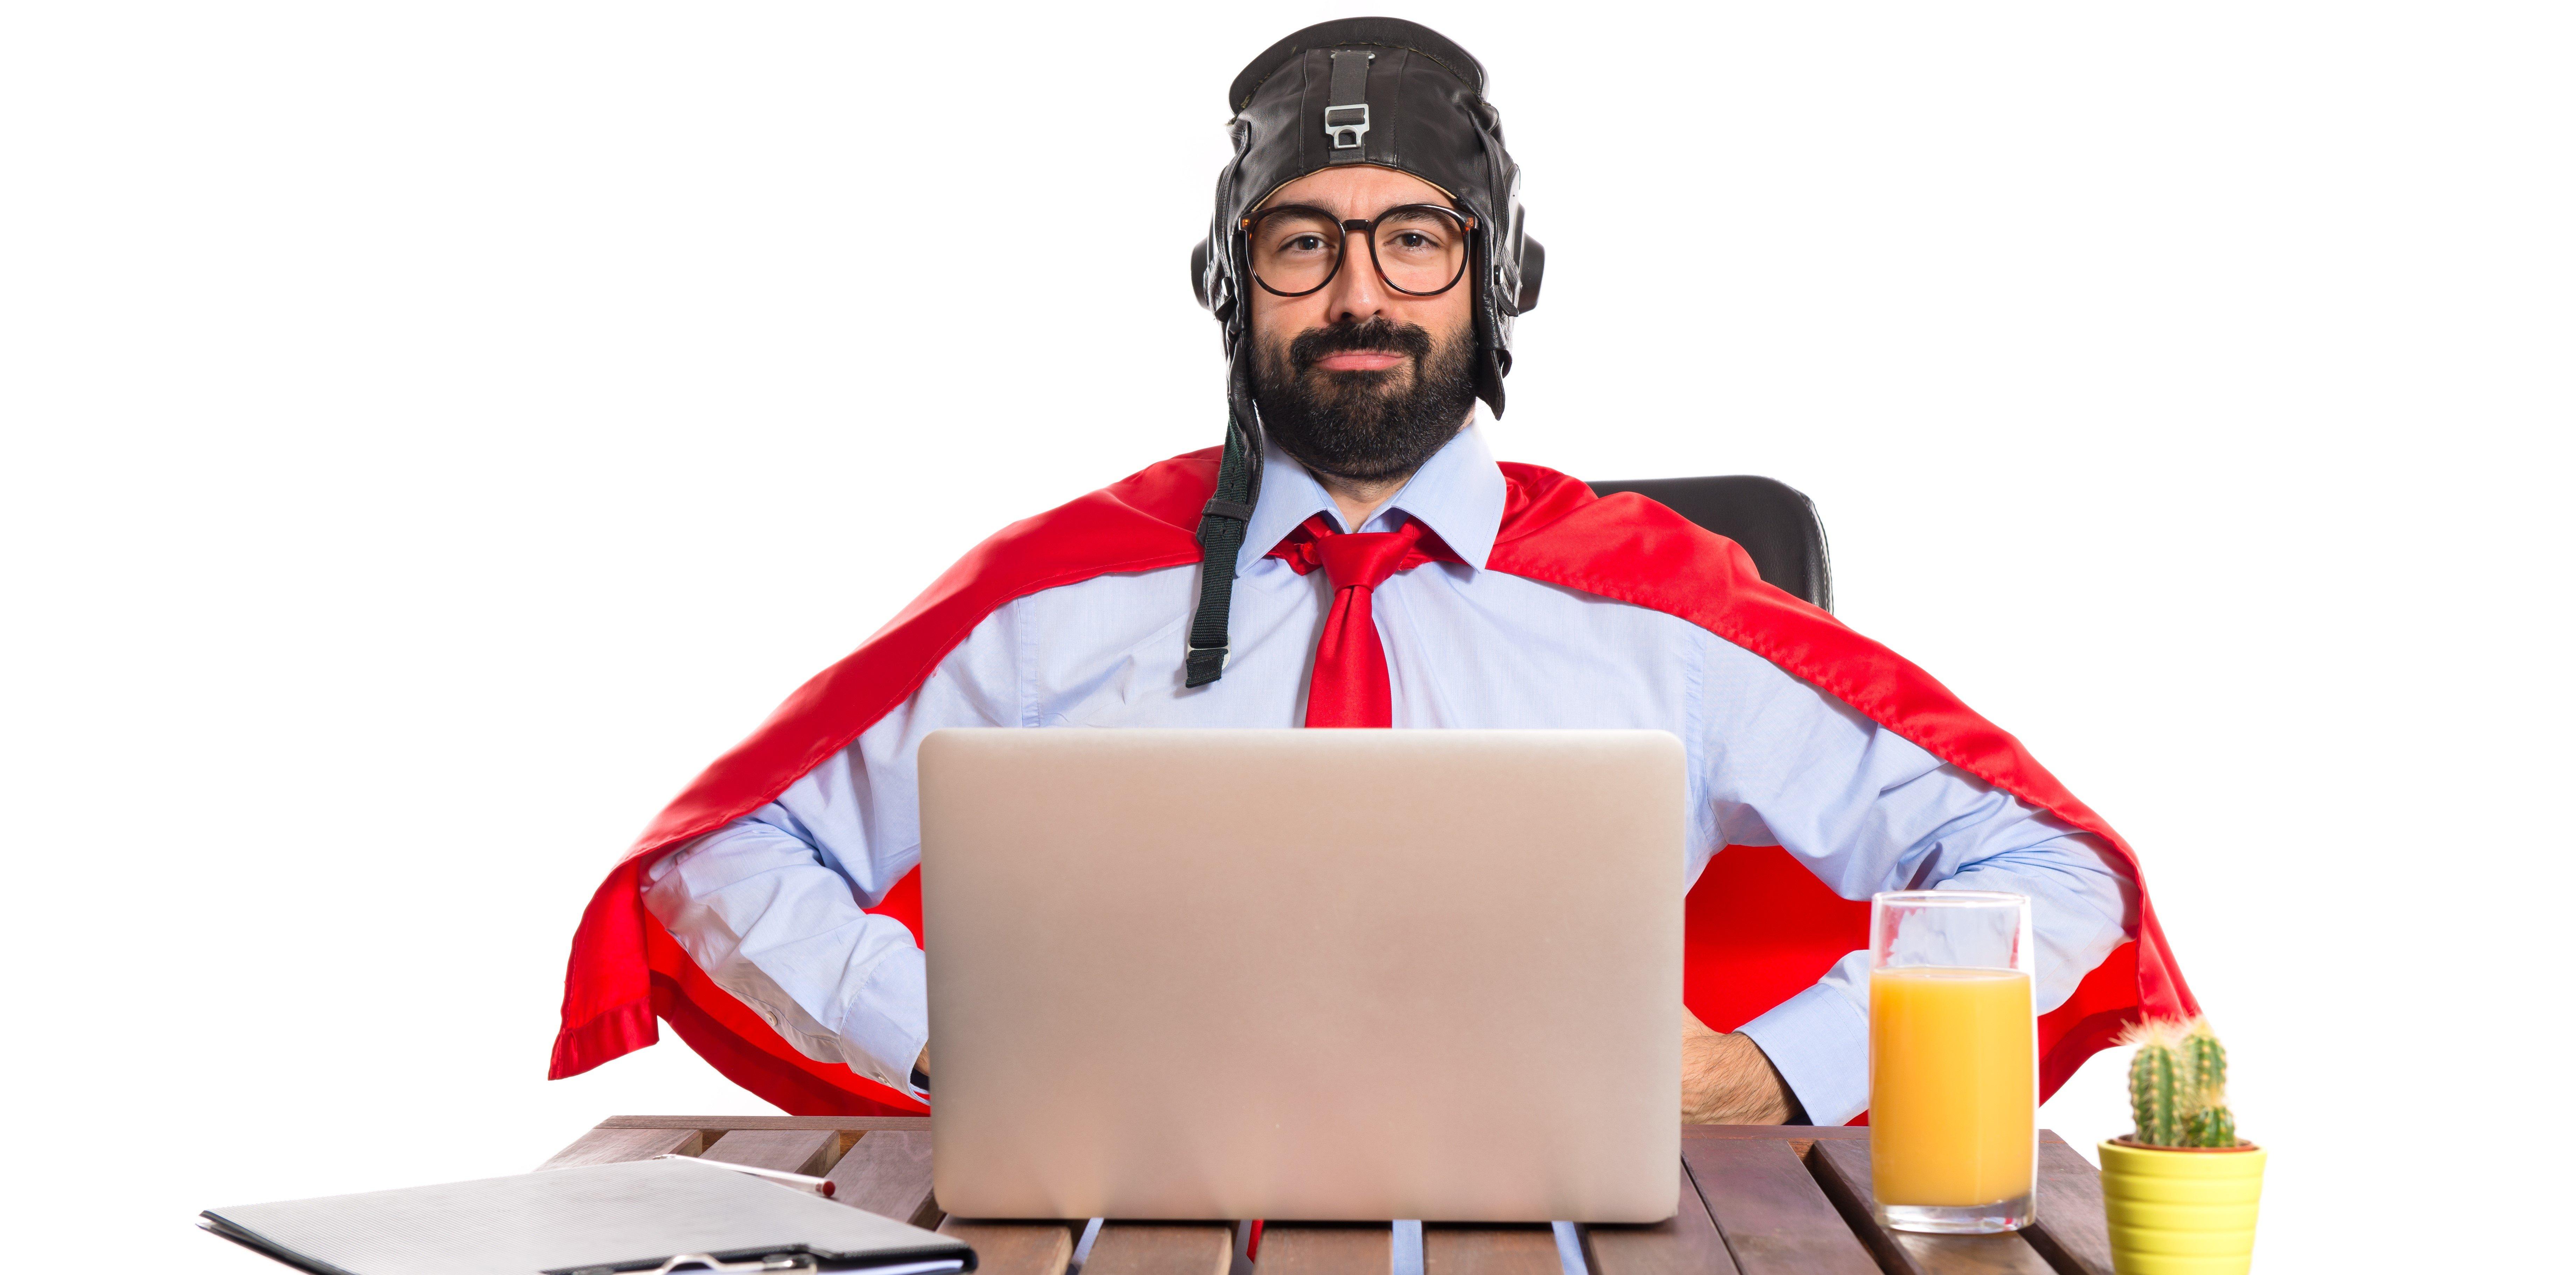 man with cape like superhero laptop wide